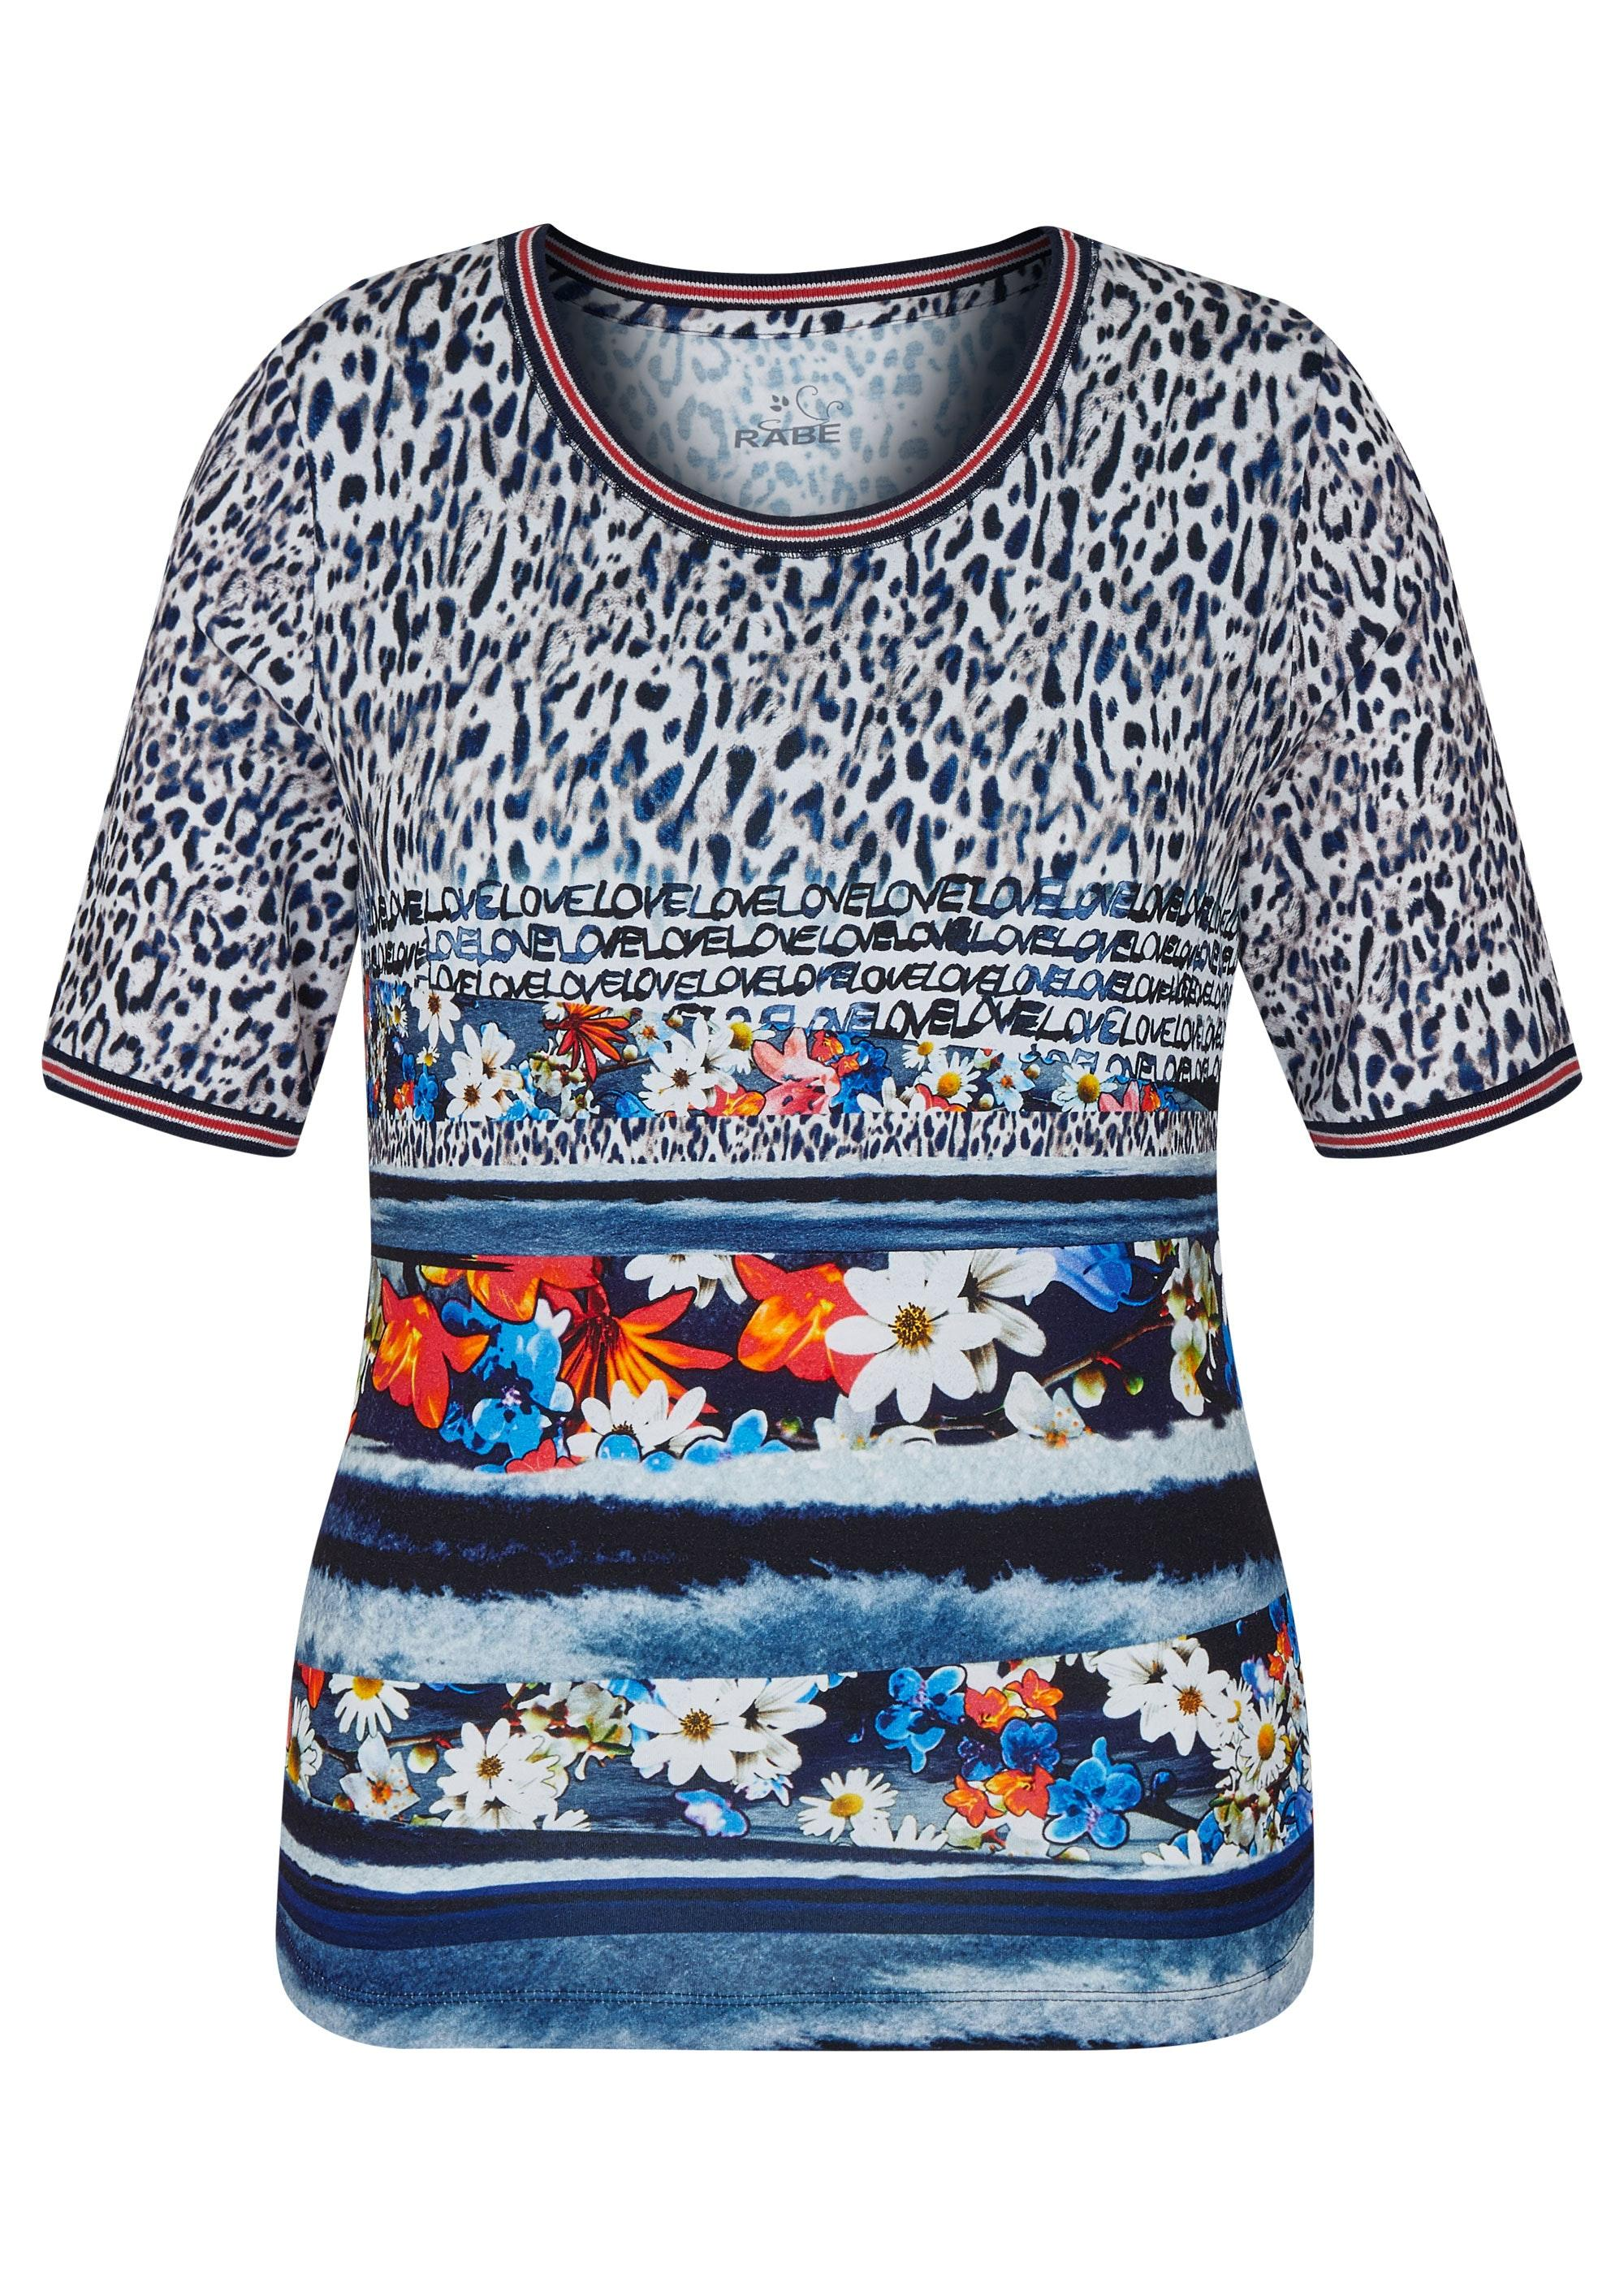 Rabe halbarm Shirt mit Allover-Muster blau